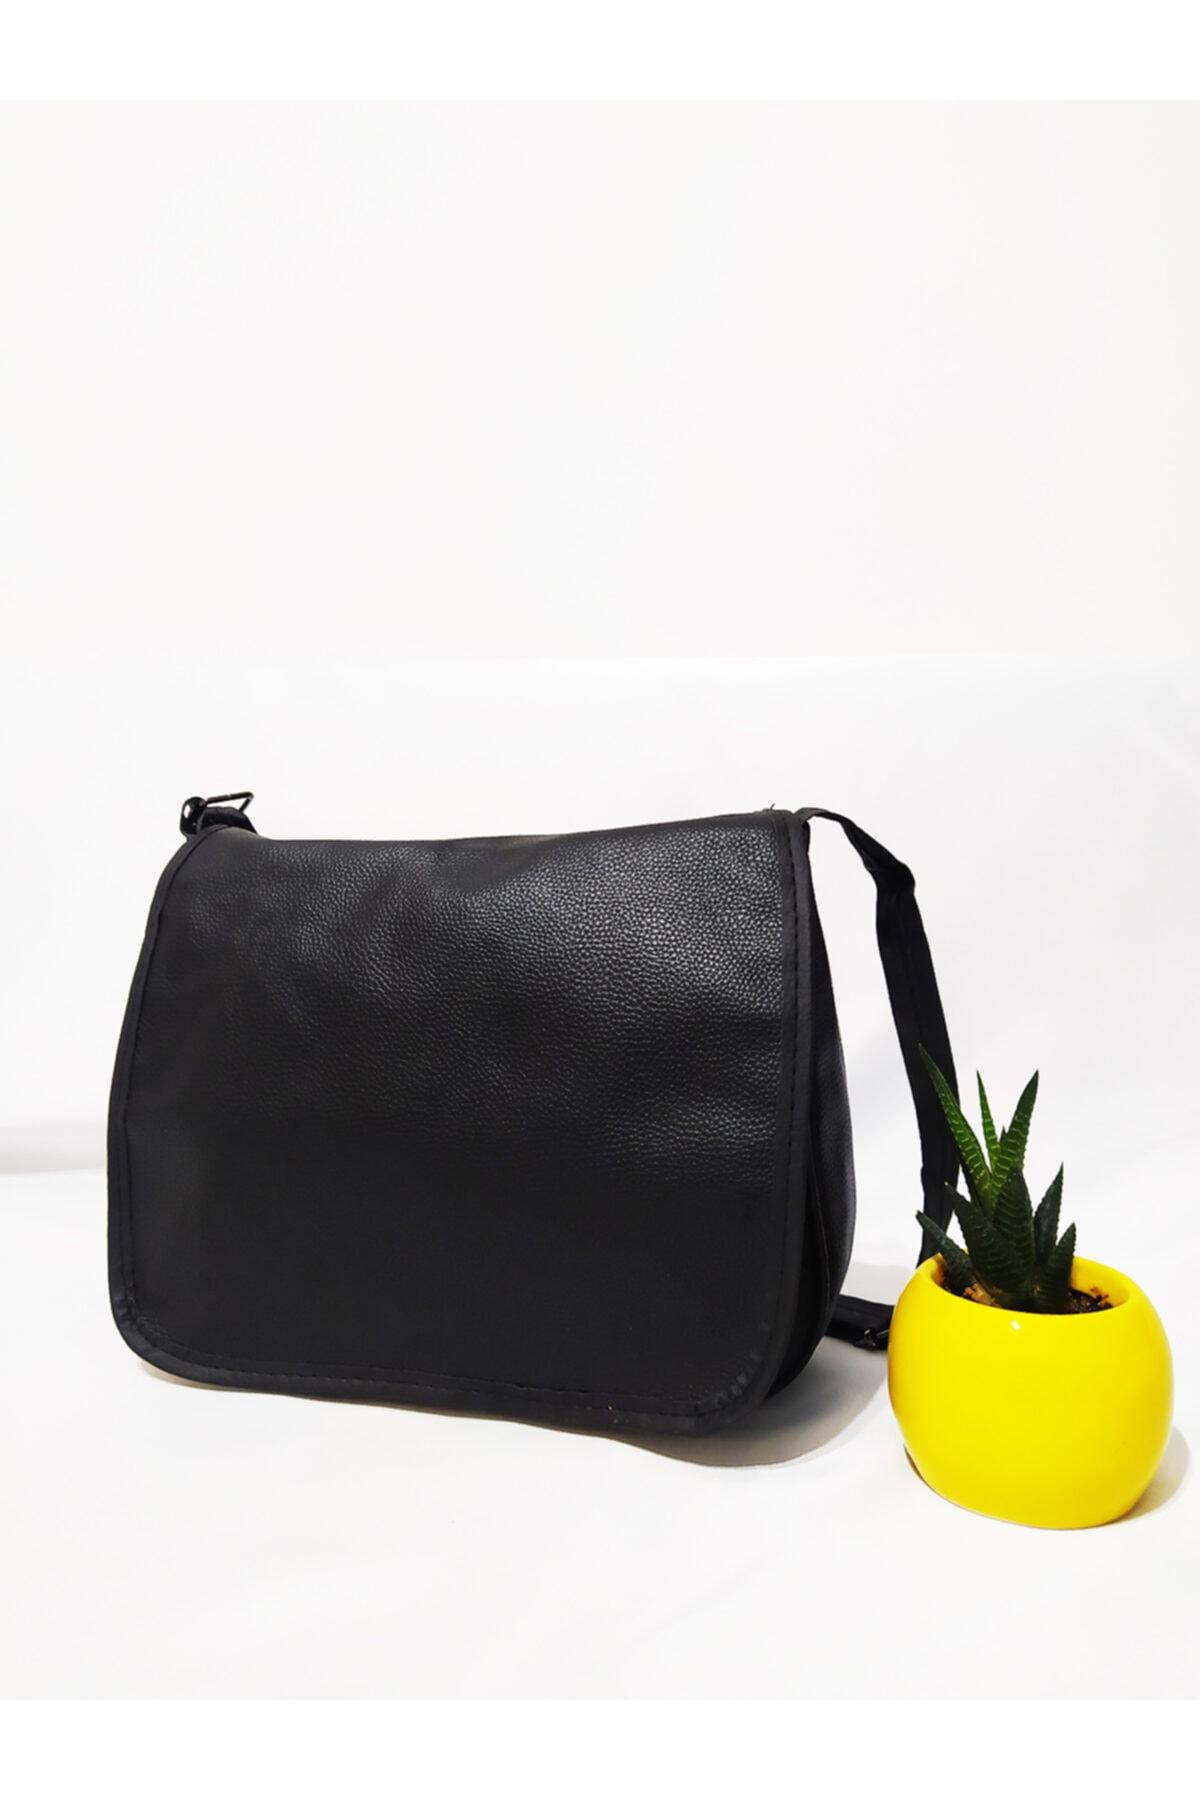 Sheilann Siyah Çapraz Kapaklı Çanta 1